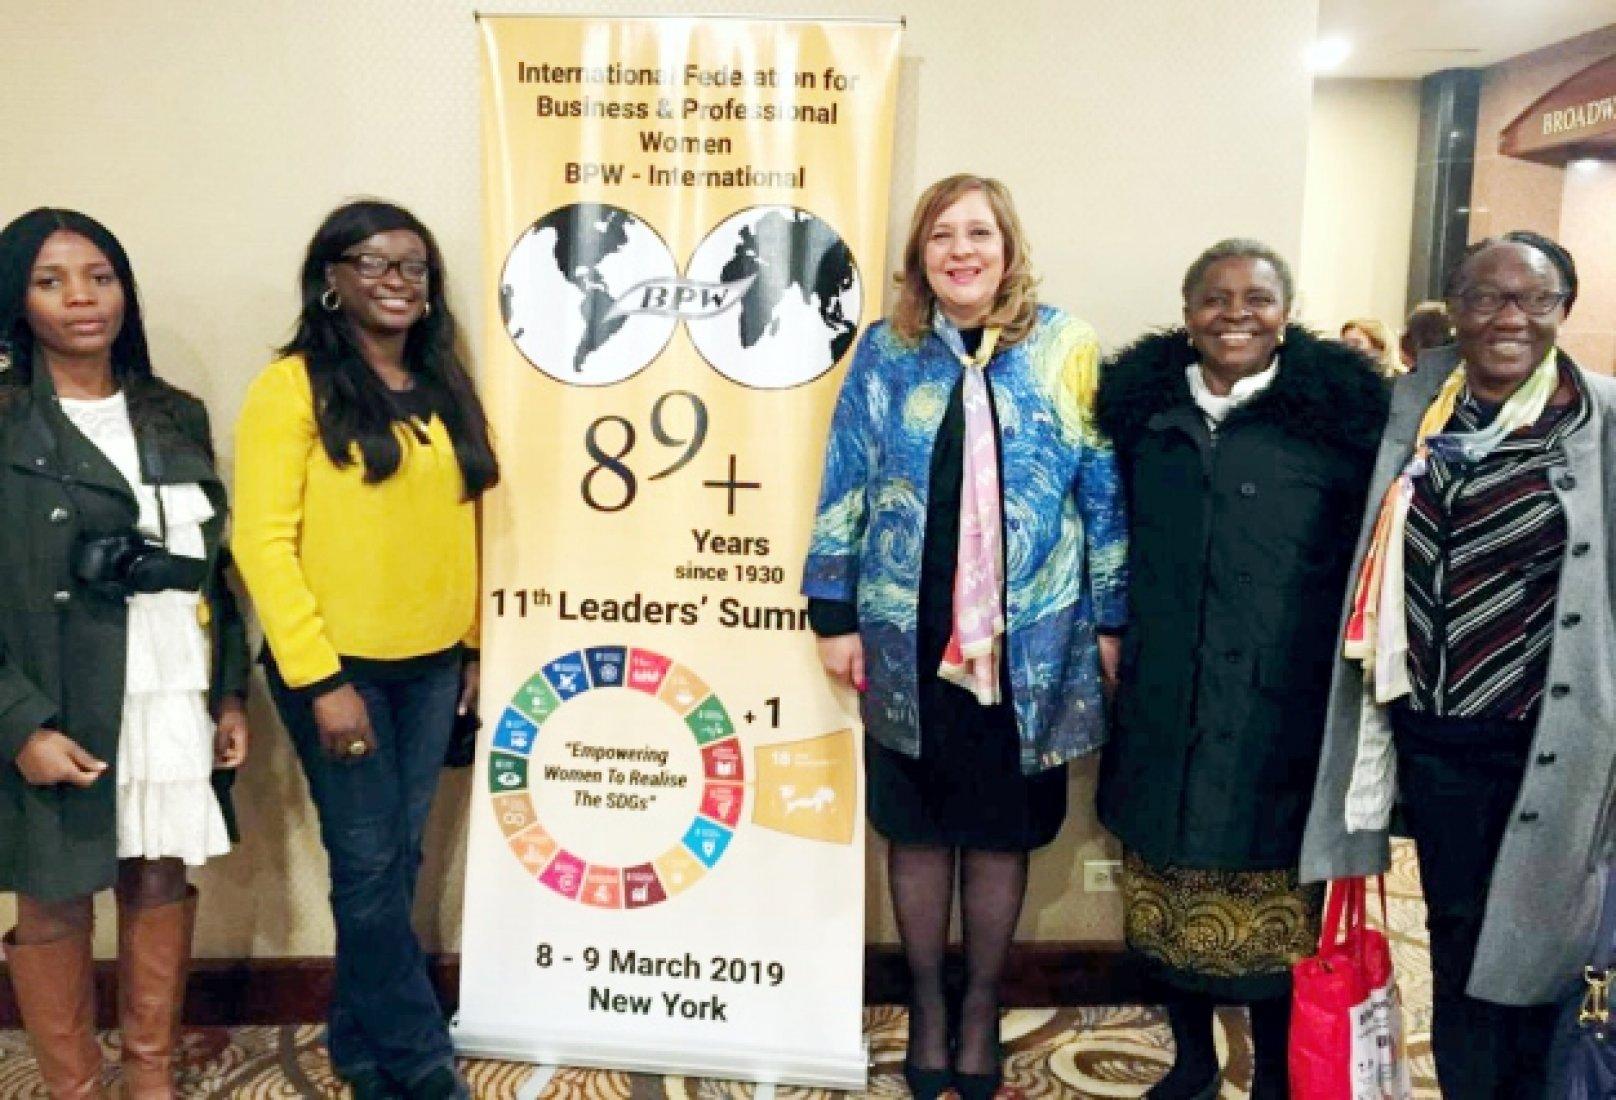 BPW Nigeria members at BPW International Leadership Summit 2019